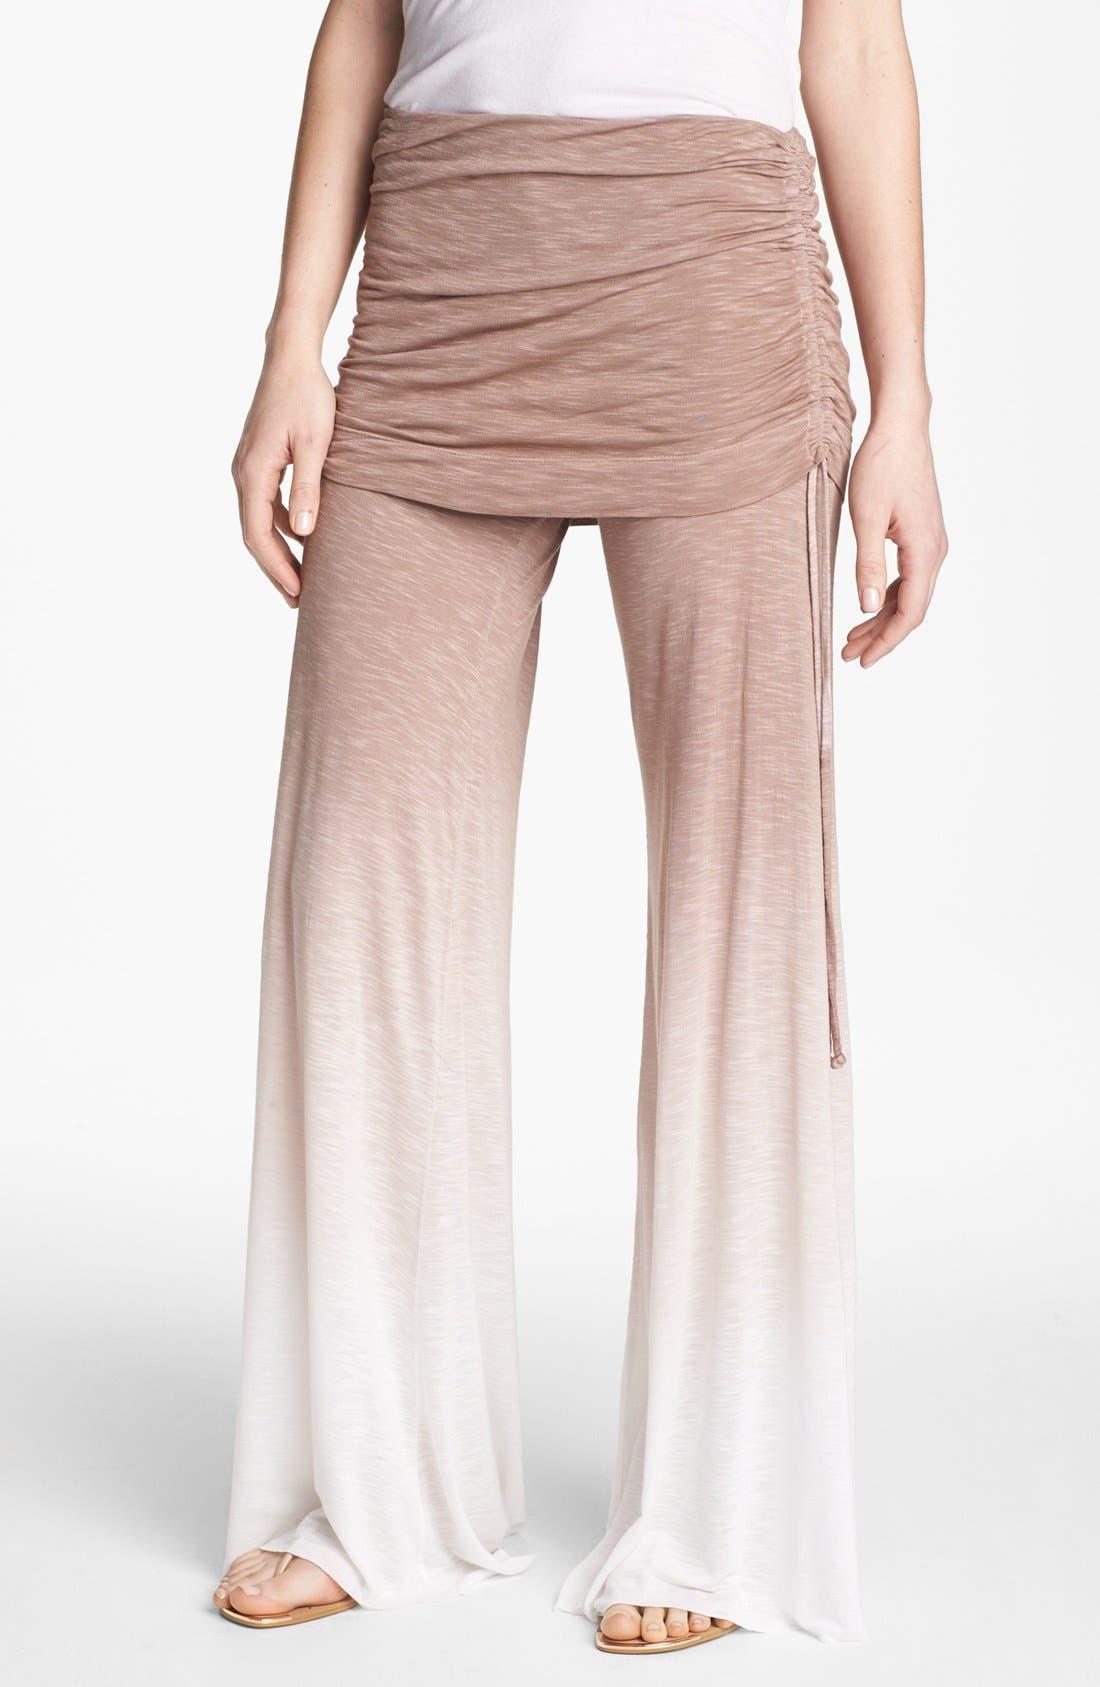 Main Image - Young, Fabulous & Broke 'Sierra' Ruched Wide Leg Pants